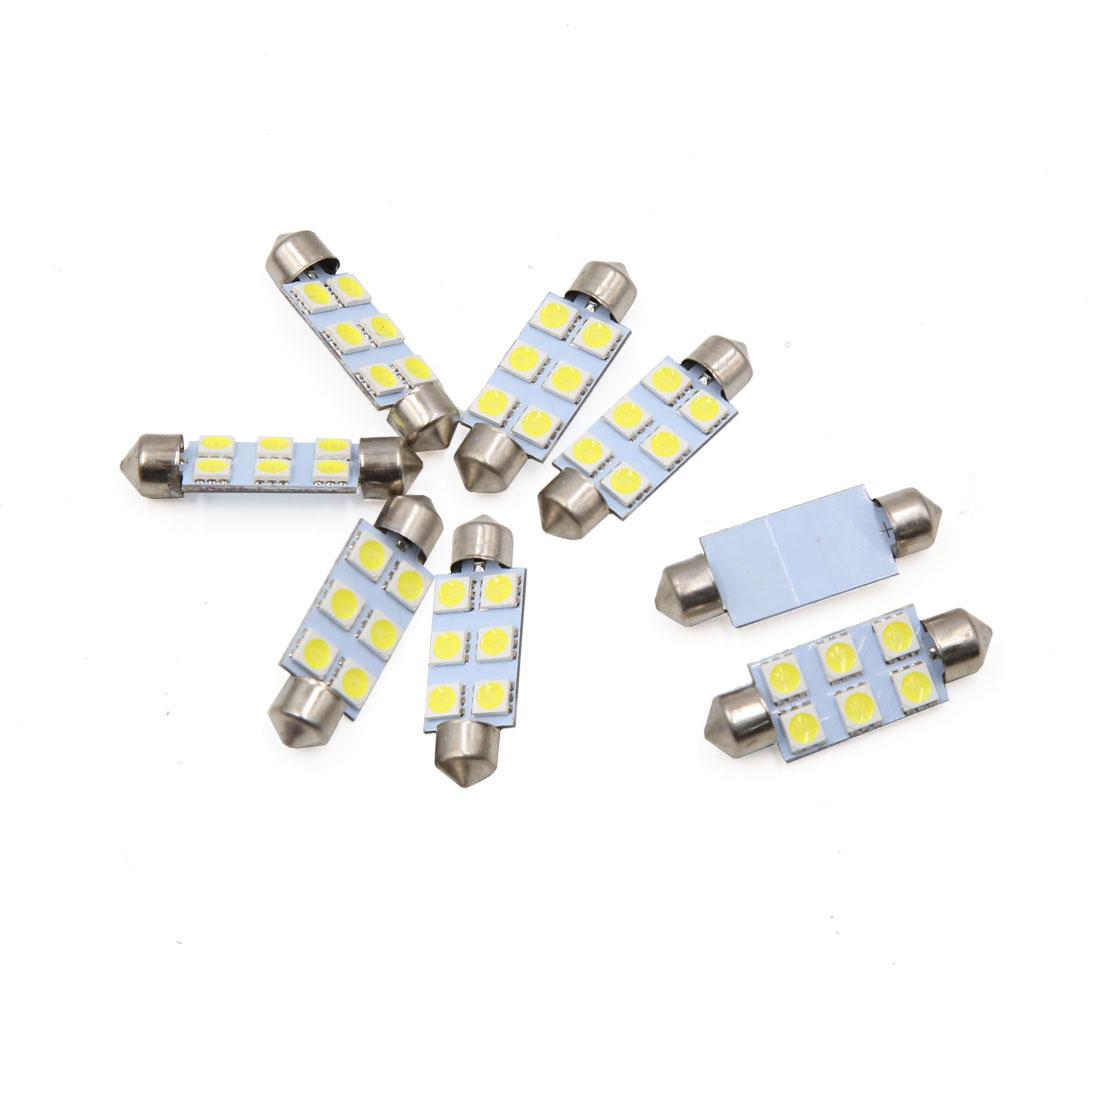 8pcs White 41mm 5050 SMD 6 LED Car Auto Festoon Dome Lights Interior Lamp Bulb